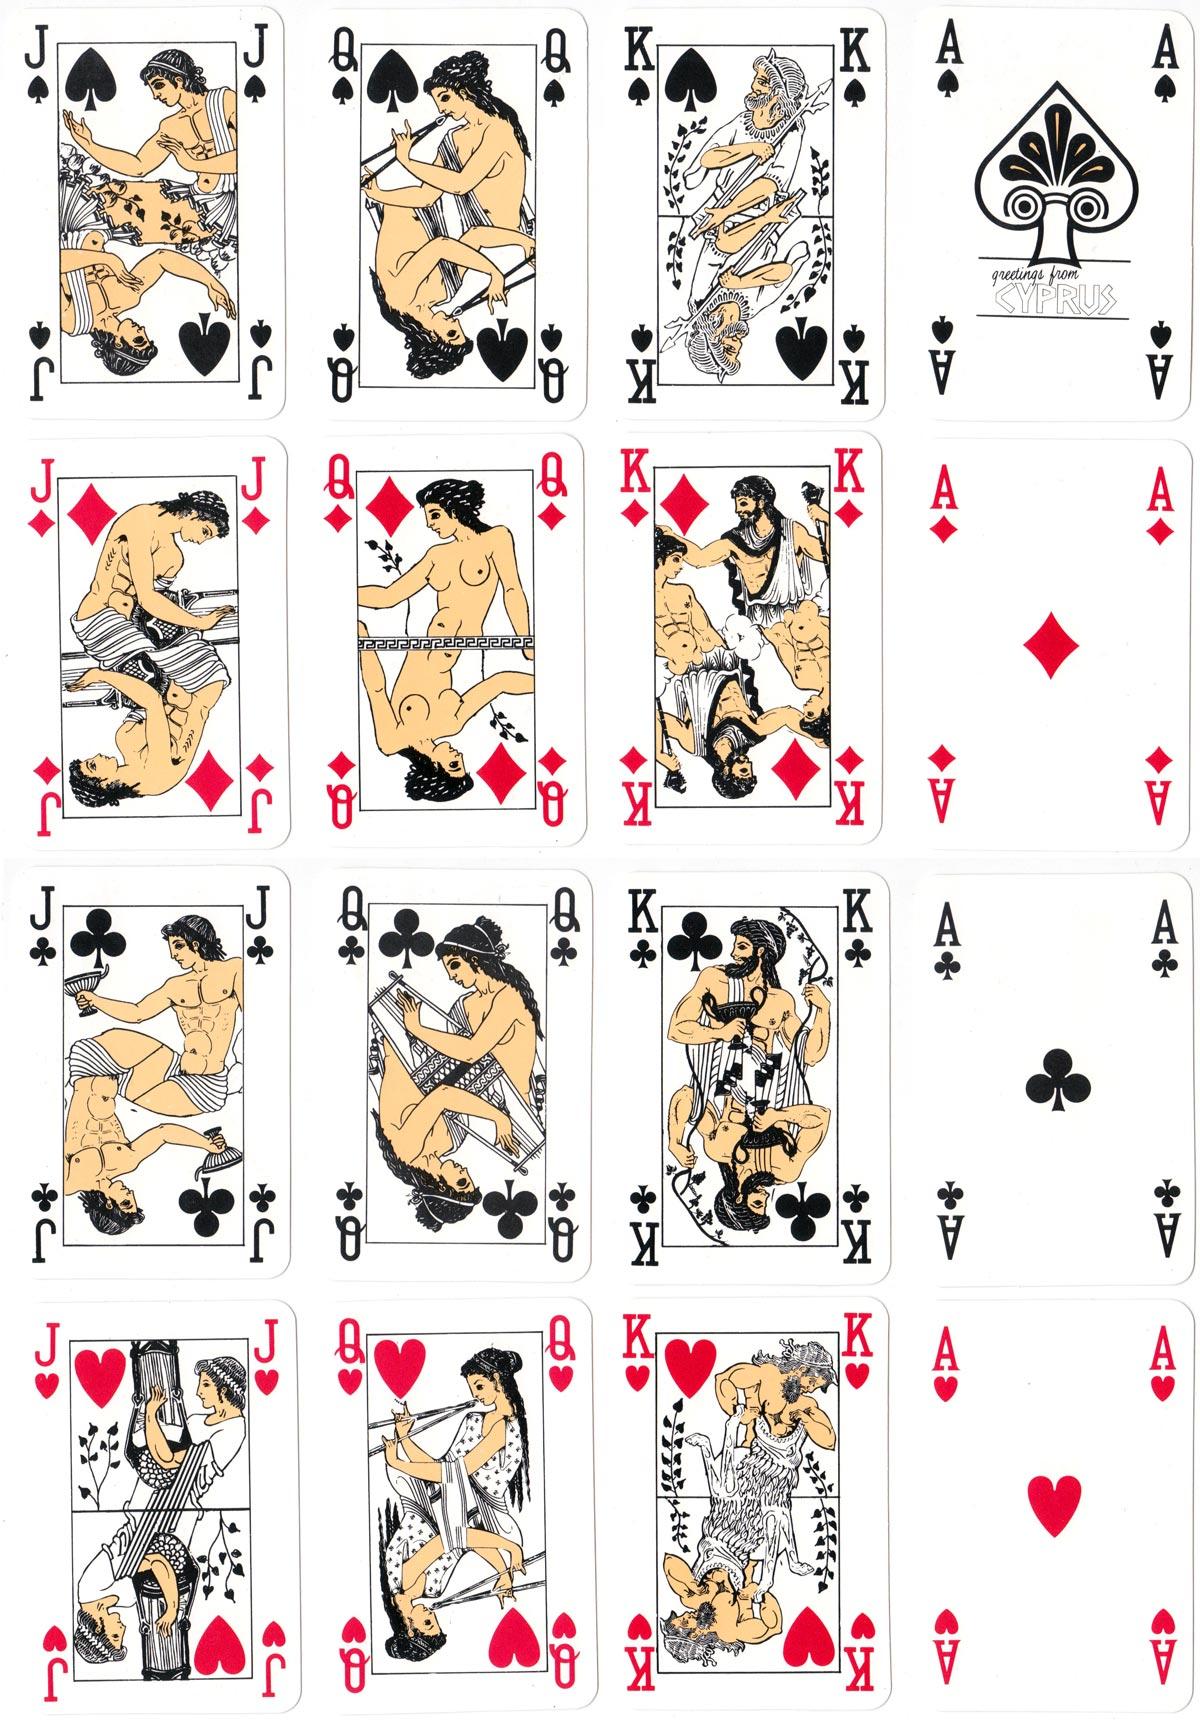 Cyprus souvenir playing cards